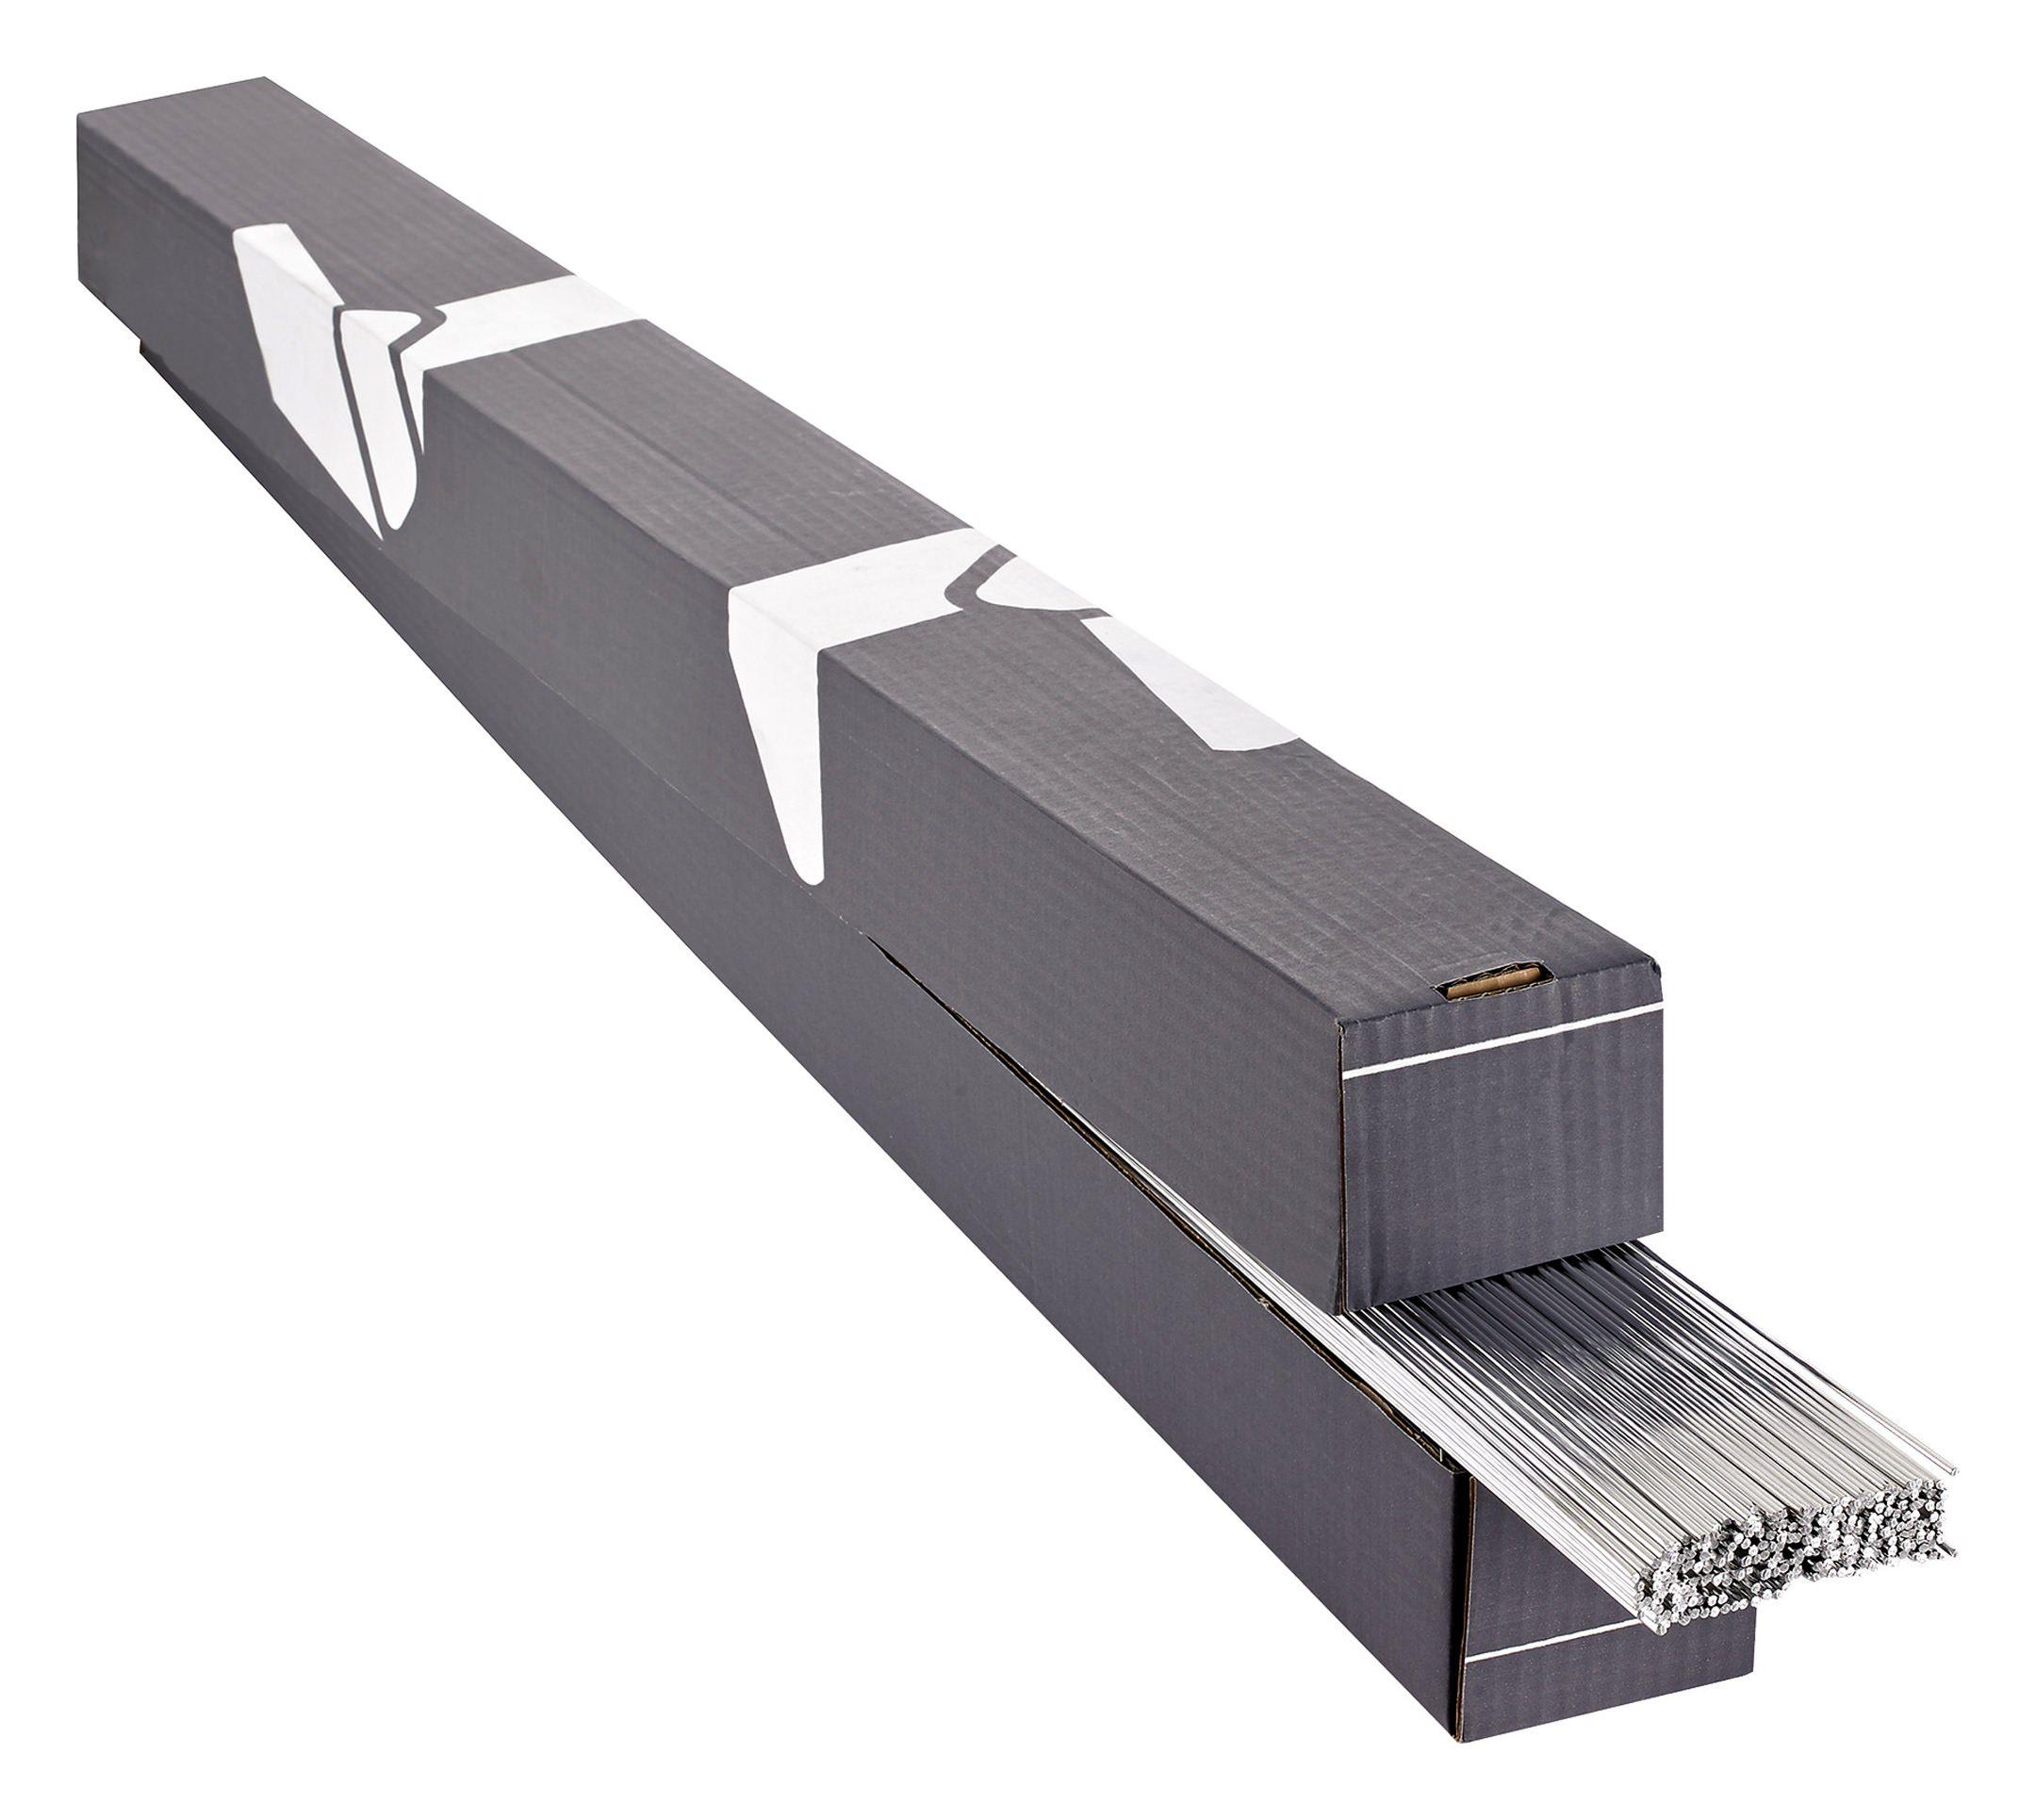 b hler schwei stab wig aluminium almg 3 2 4 x 1000mm 26186. Black Bedroom Furniture Sets. Home Design Ideas